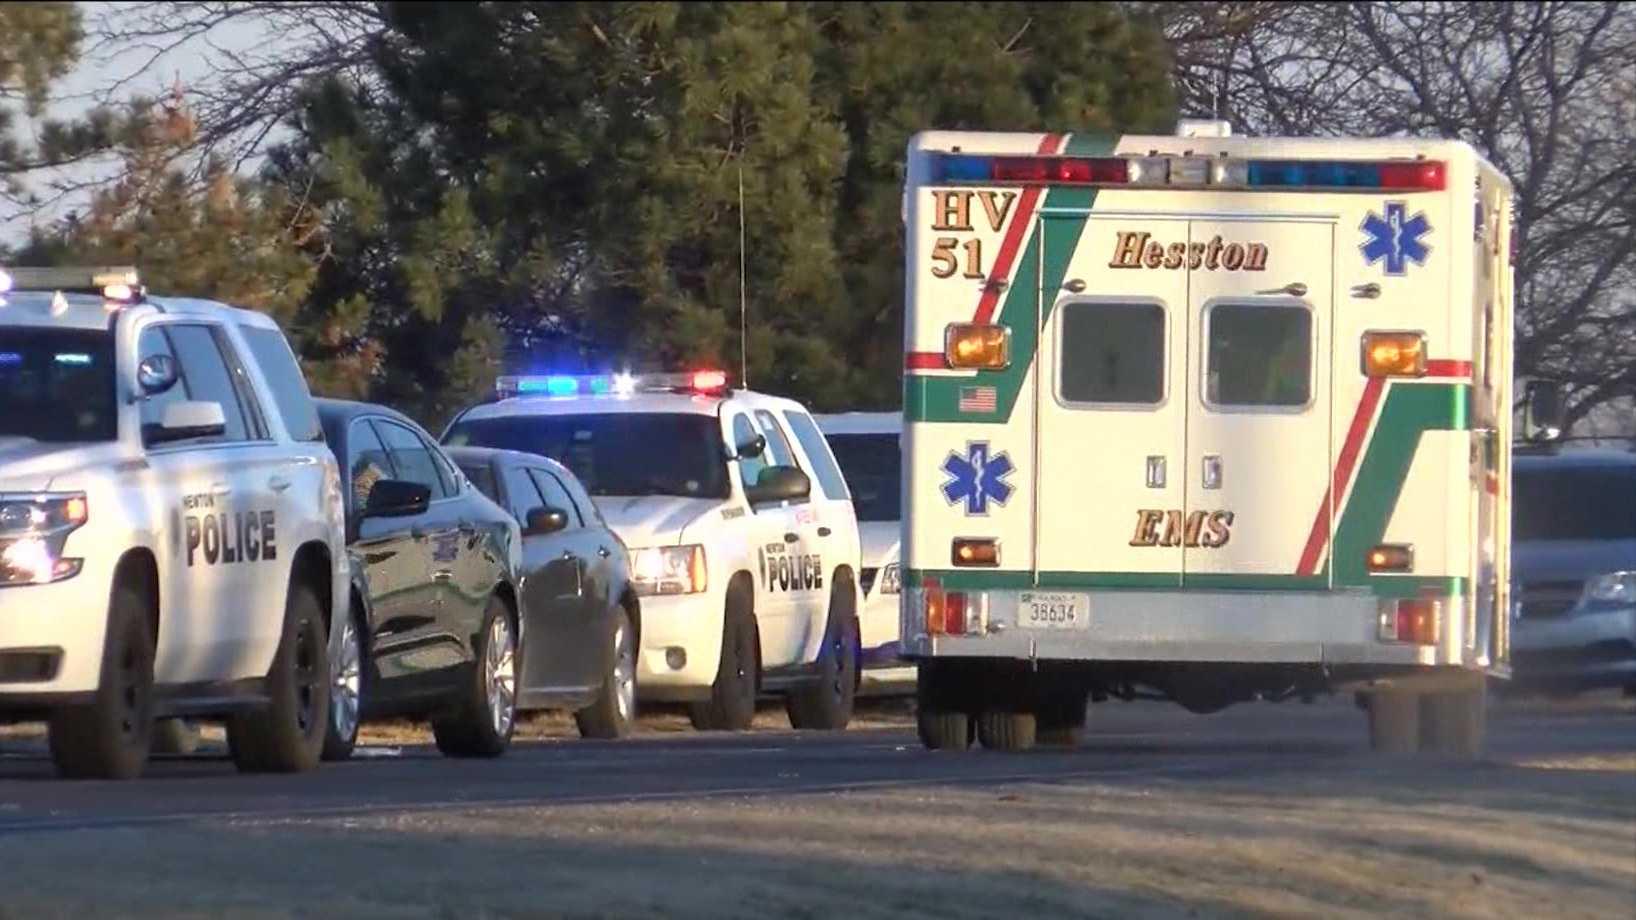 Ambulance drives away from shooting scene in Hesston, Kansas, on Thrusday, Feb. 25, 2016.